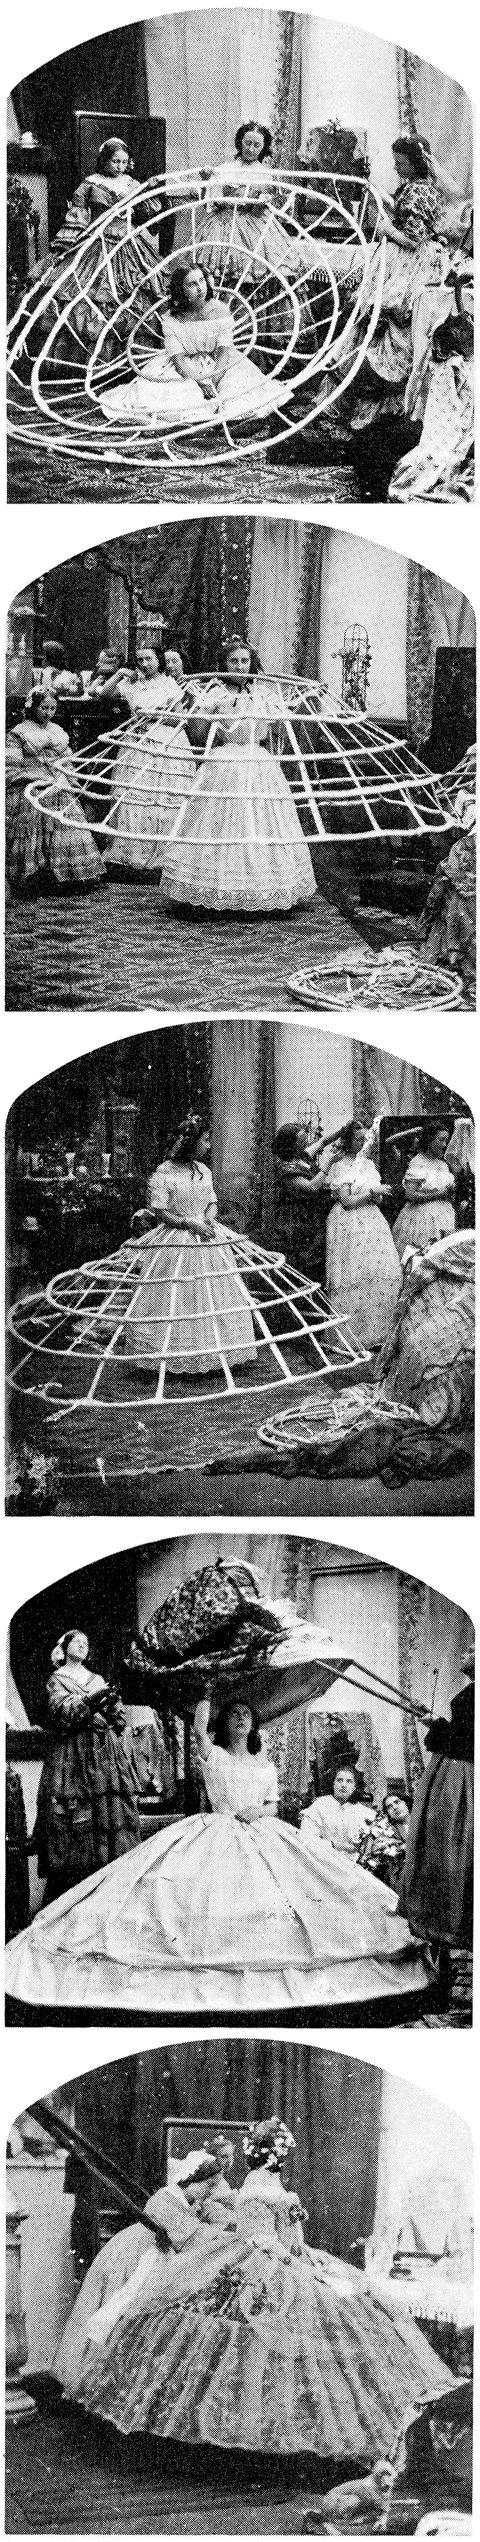 Woman putting on a crinoline